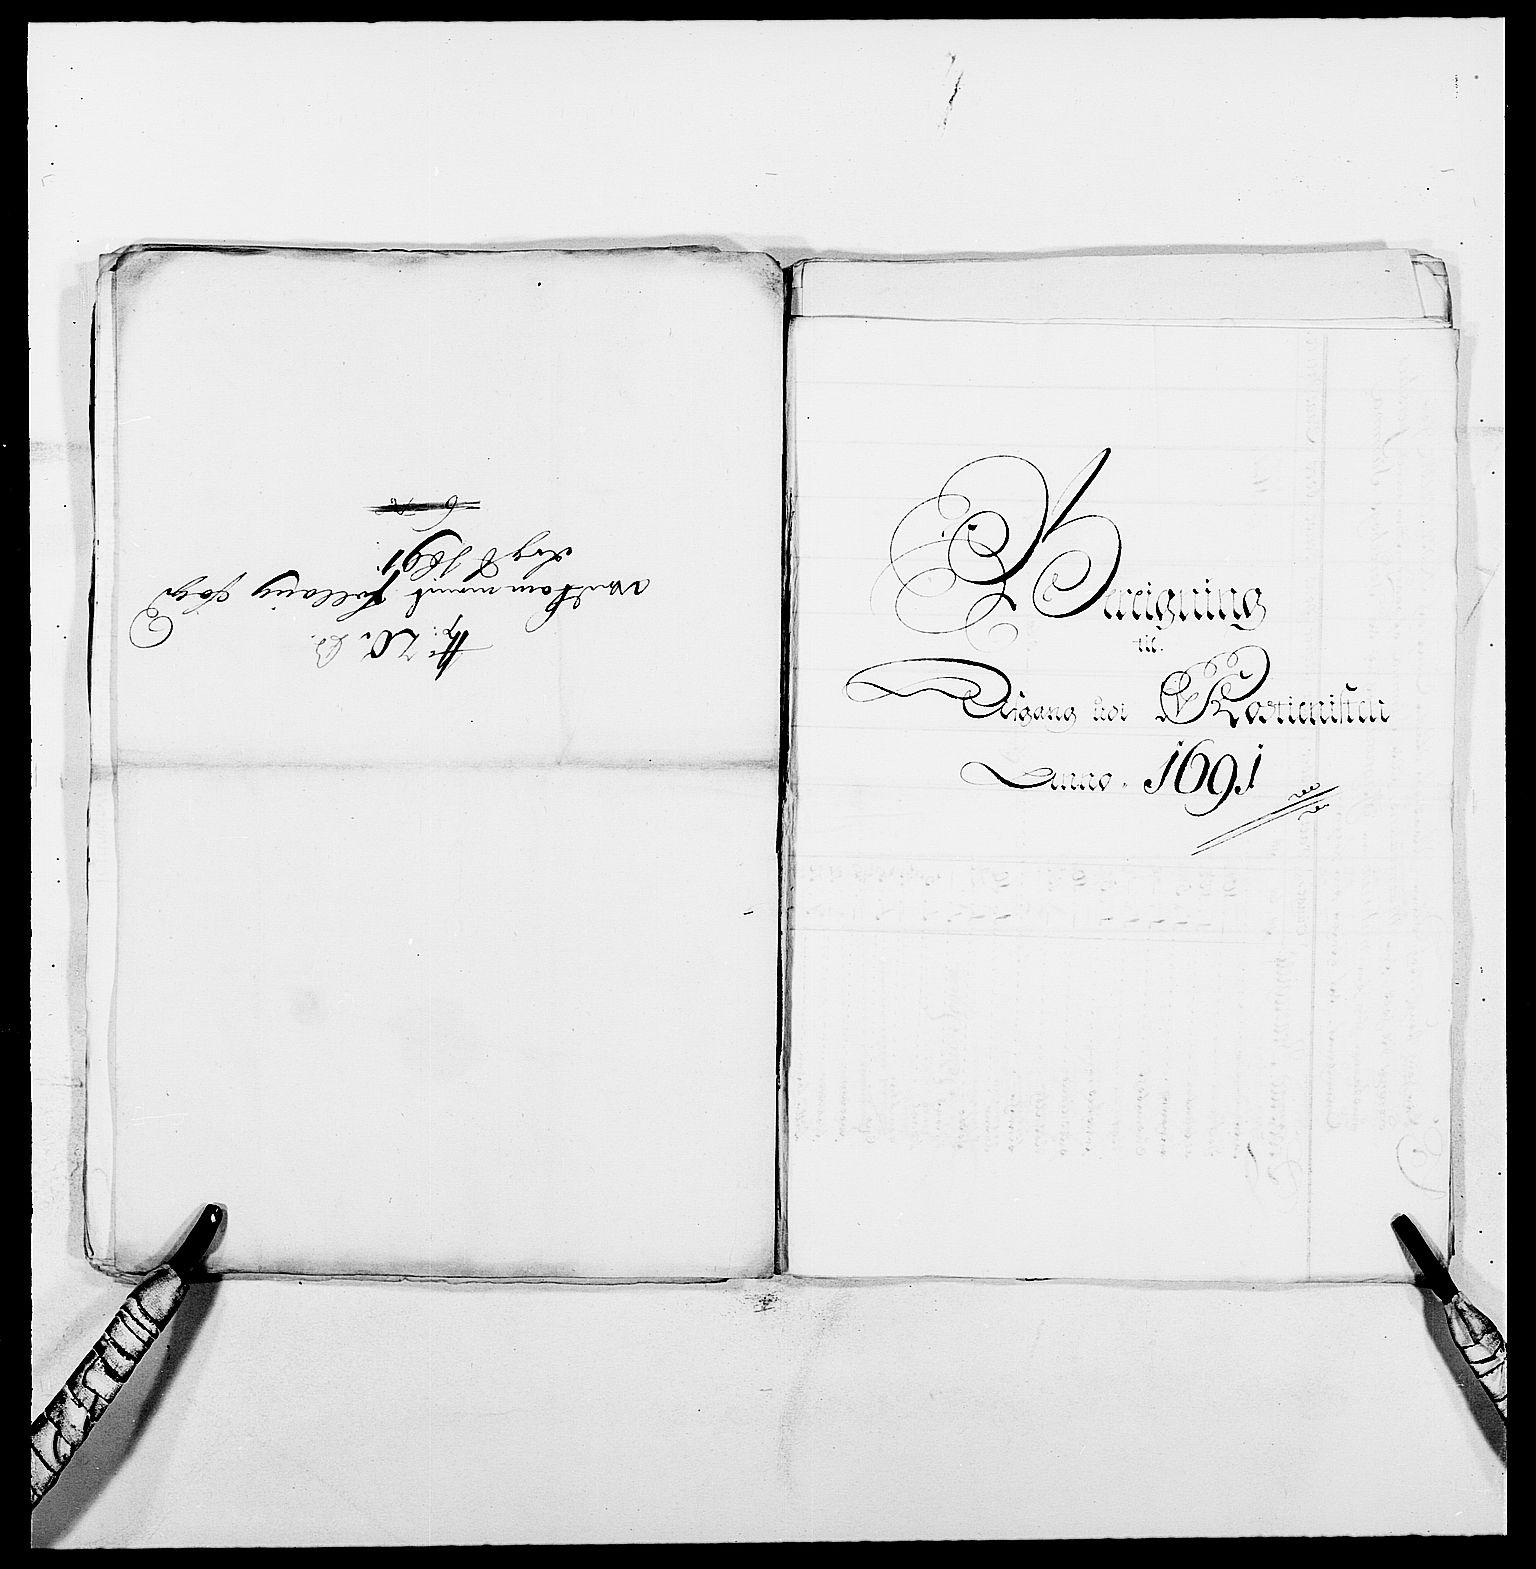 RA, Rentekammeret inntil 1814, Reviderte regnskaper, Fogderegnskap, R09/L0436: Fogderegnskap Follo, 1685-1691, s. 243